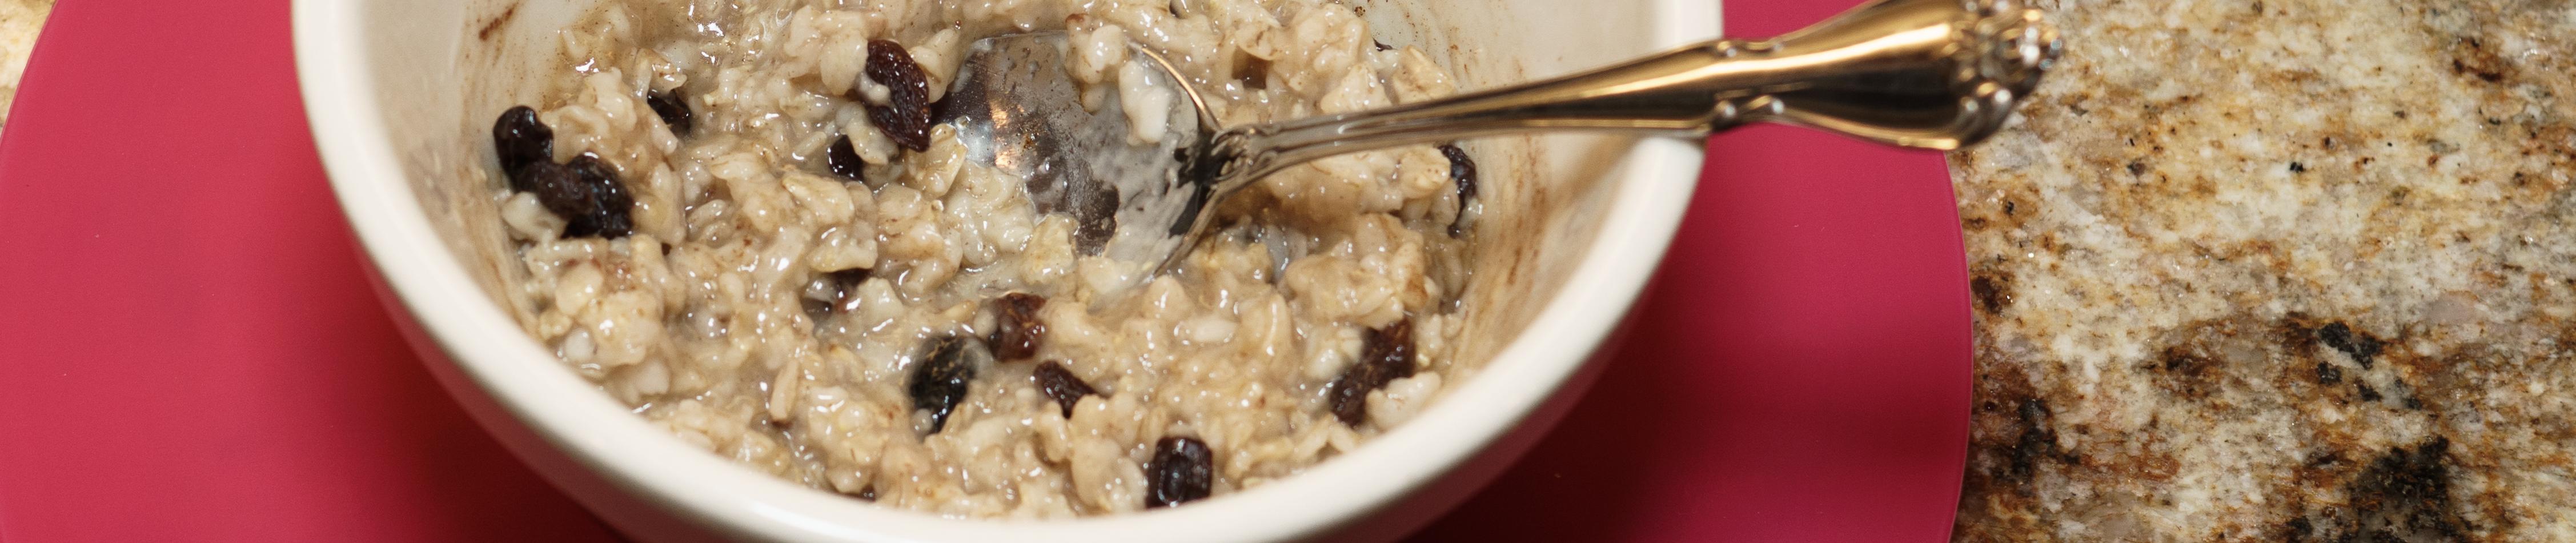 Oatmeal banner photo